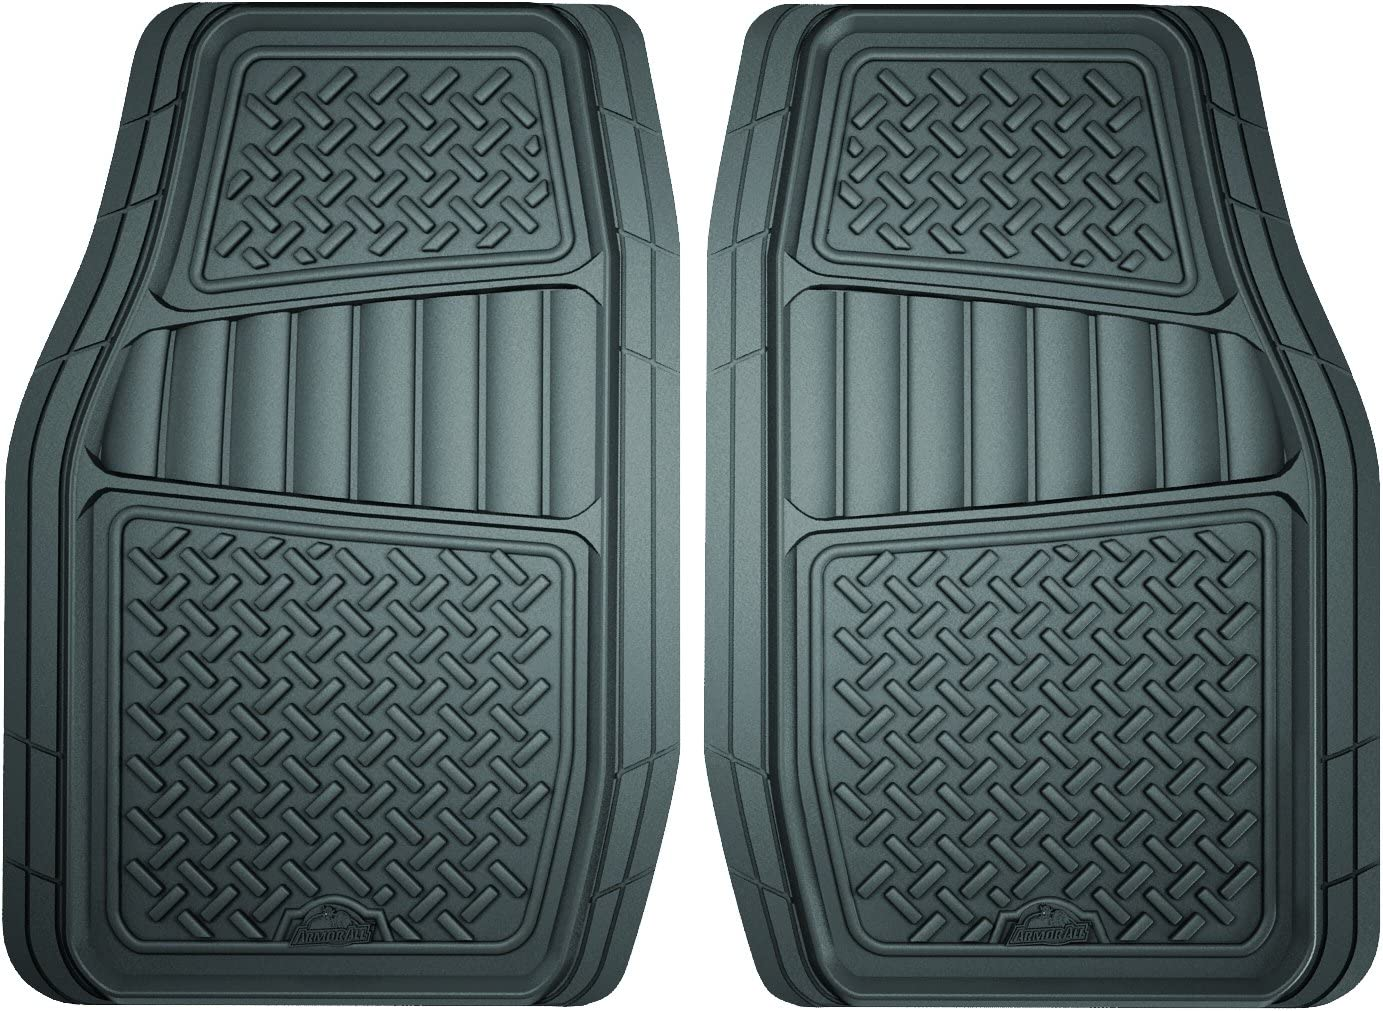 Armor All Custom Accessories 78831 2-Piece Grey All Season Truck/SUV Rubber Floor Mat